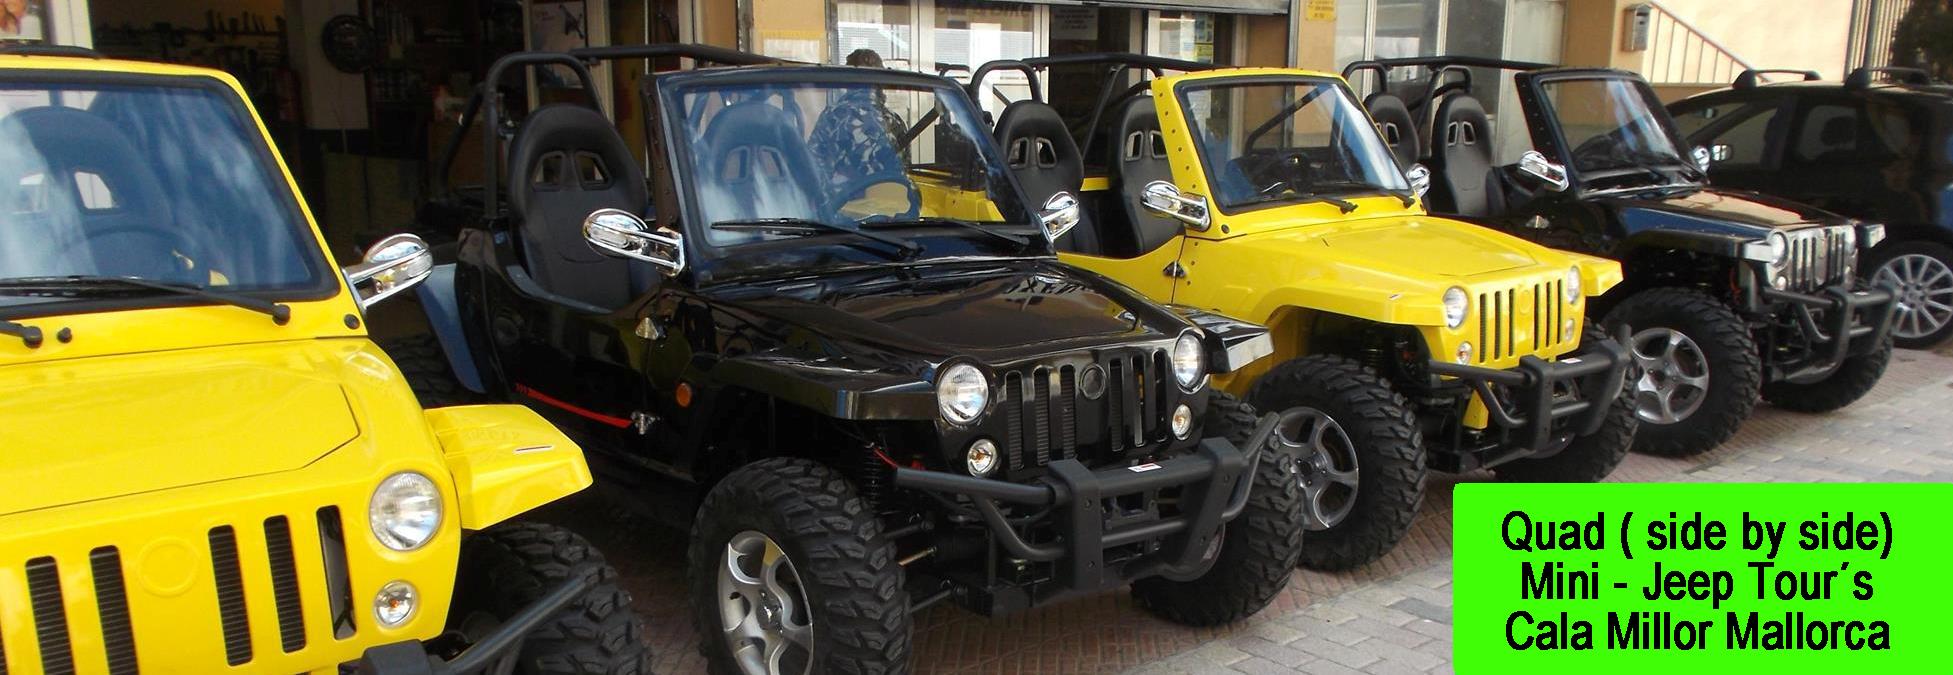 Quad Mini Jeep Tours Mallorca Cala Millor Top Tip